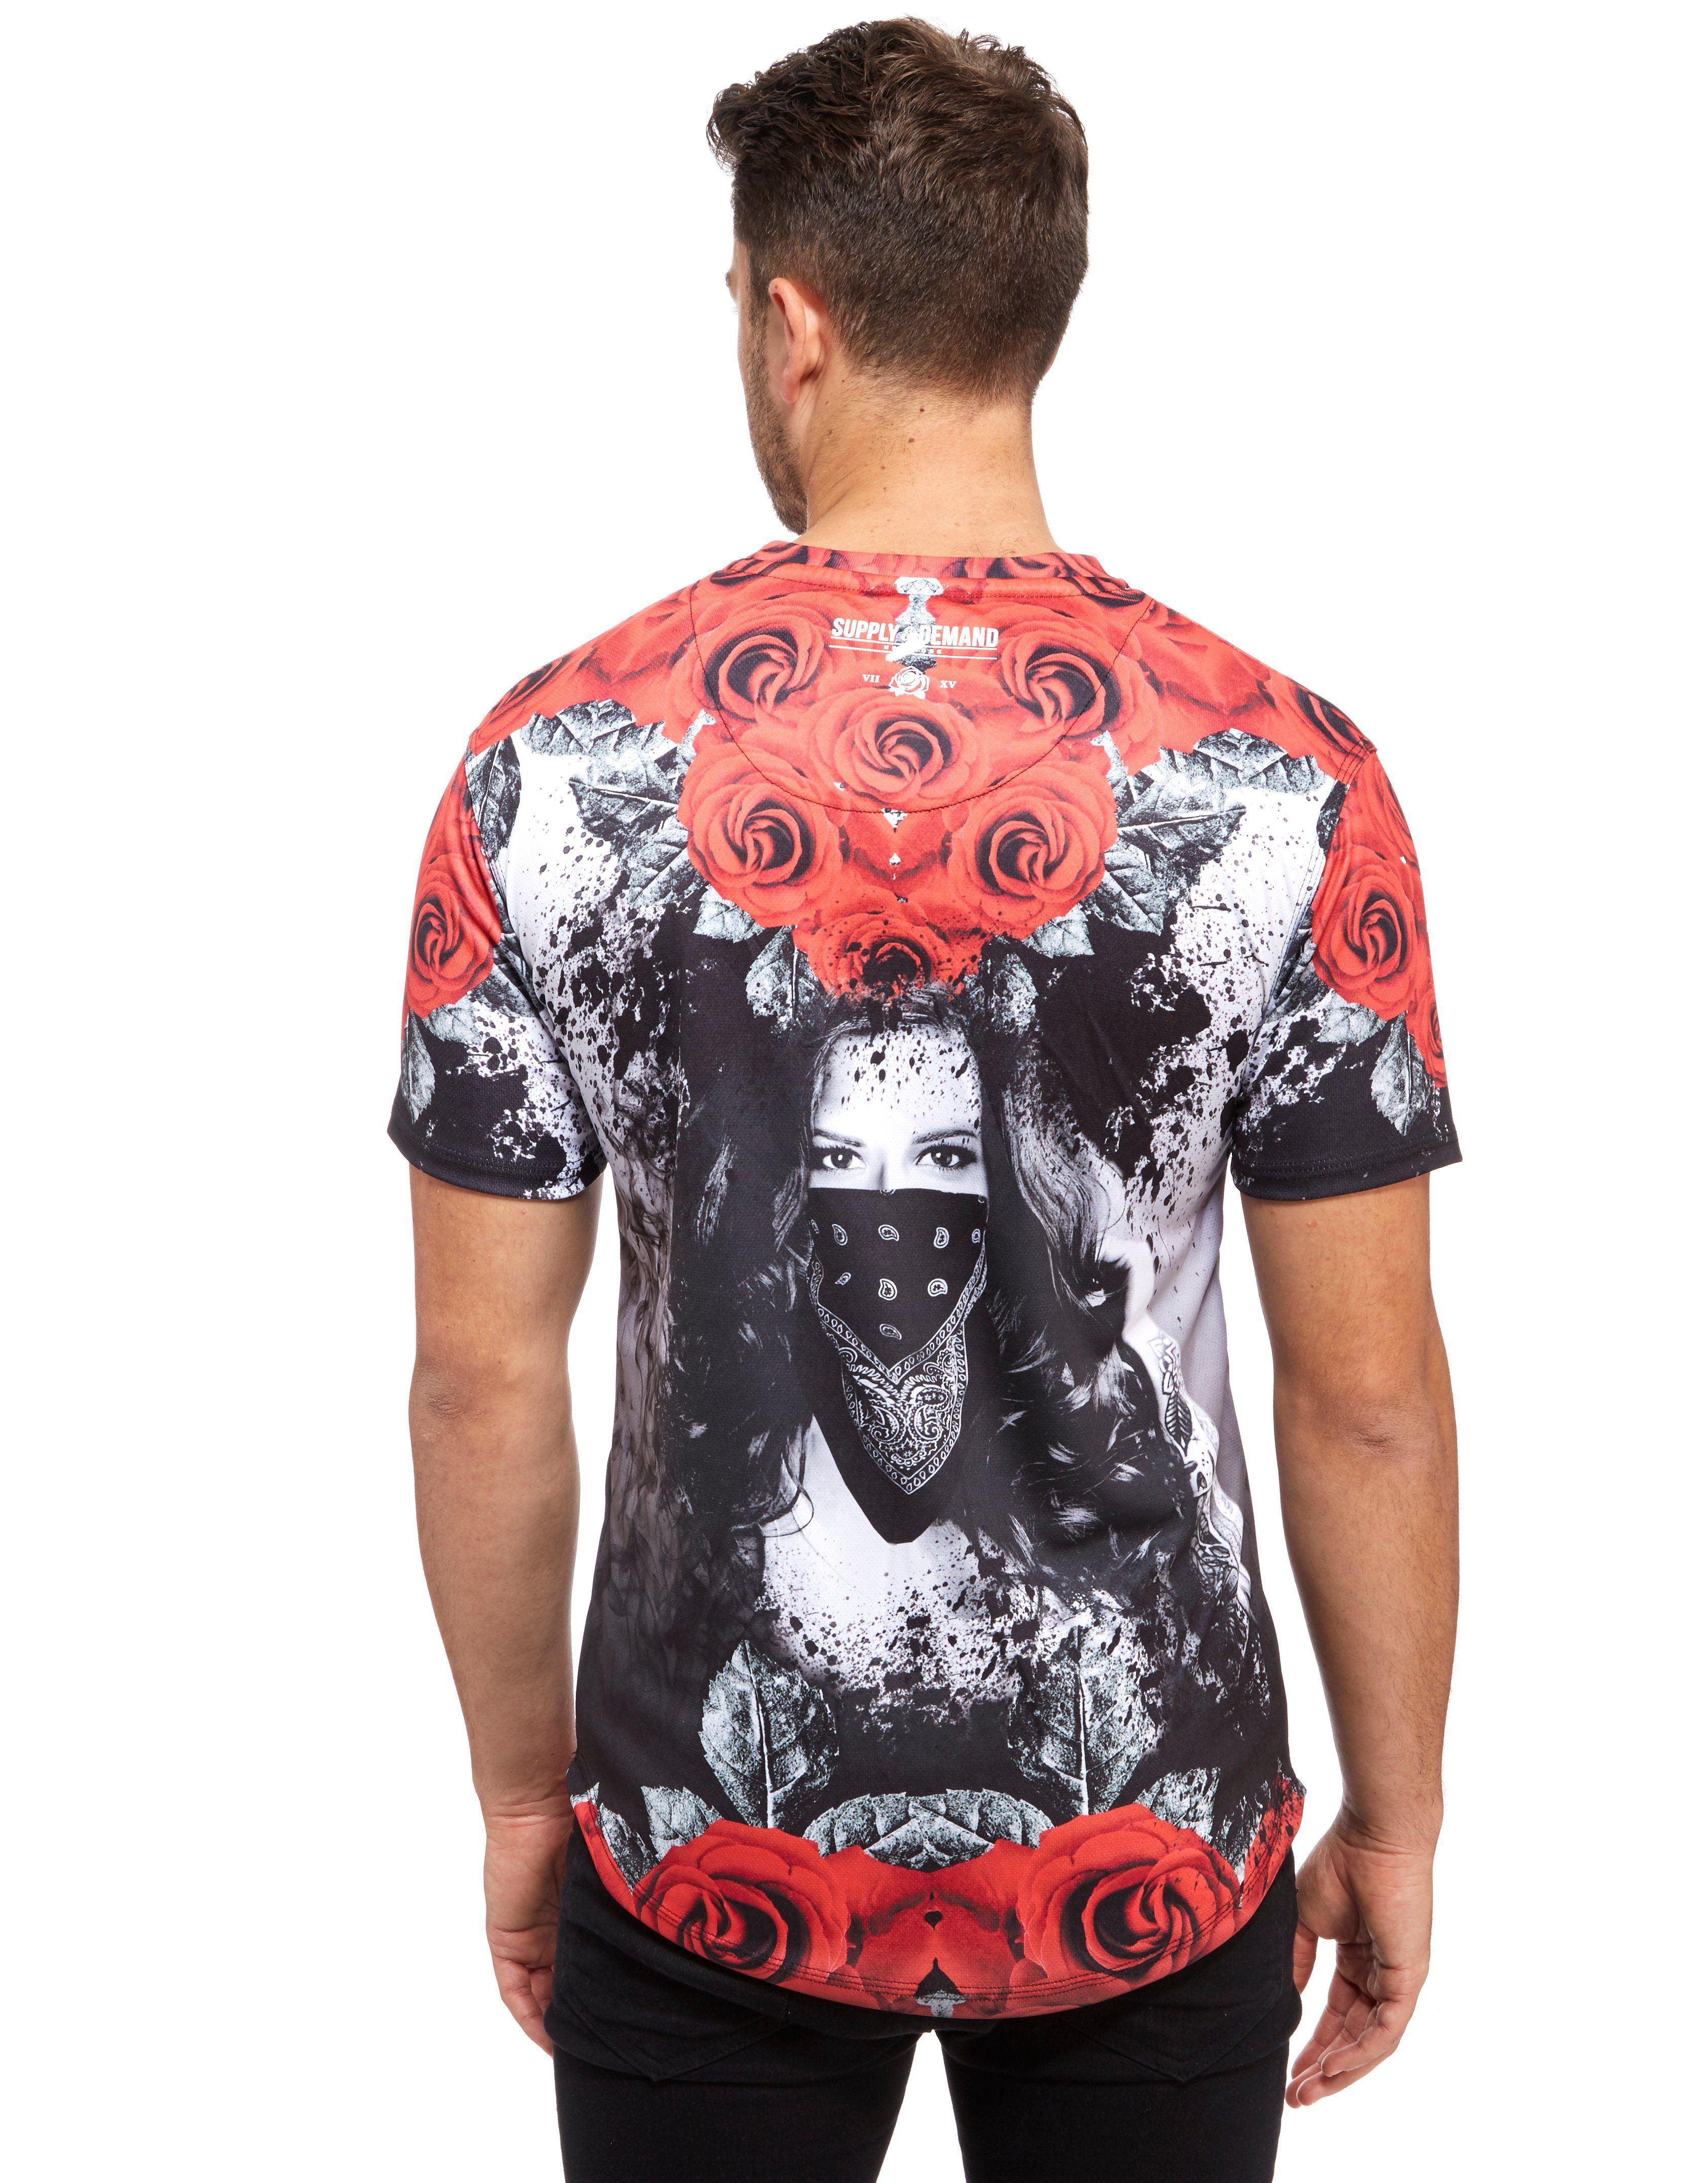 Supply & Demand Lust T-Shirt